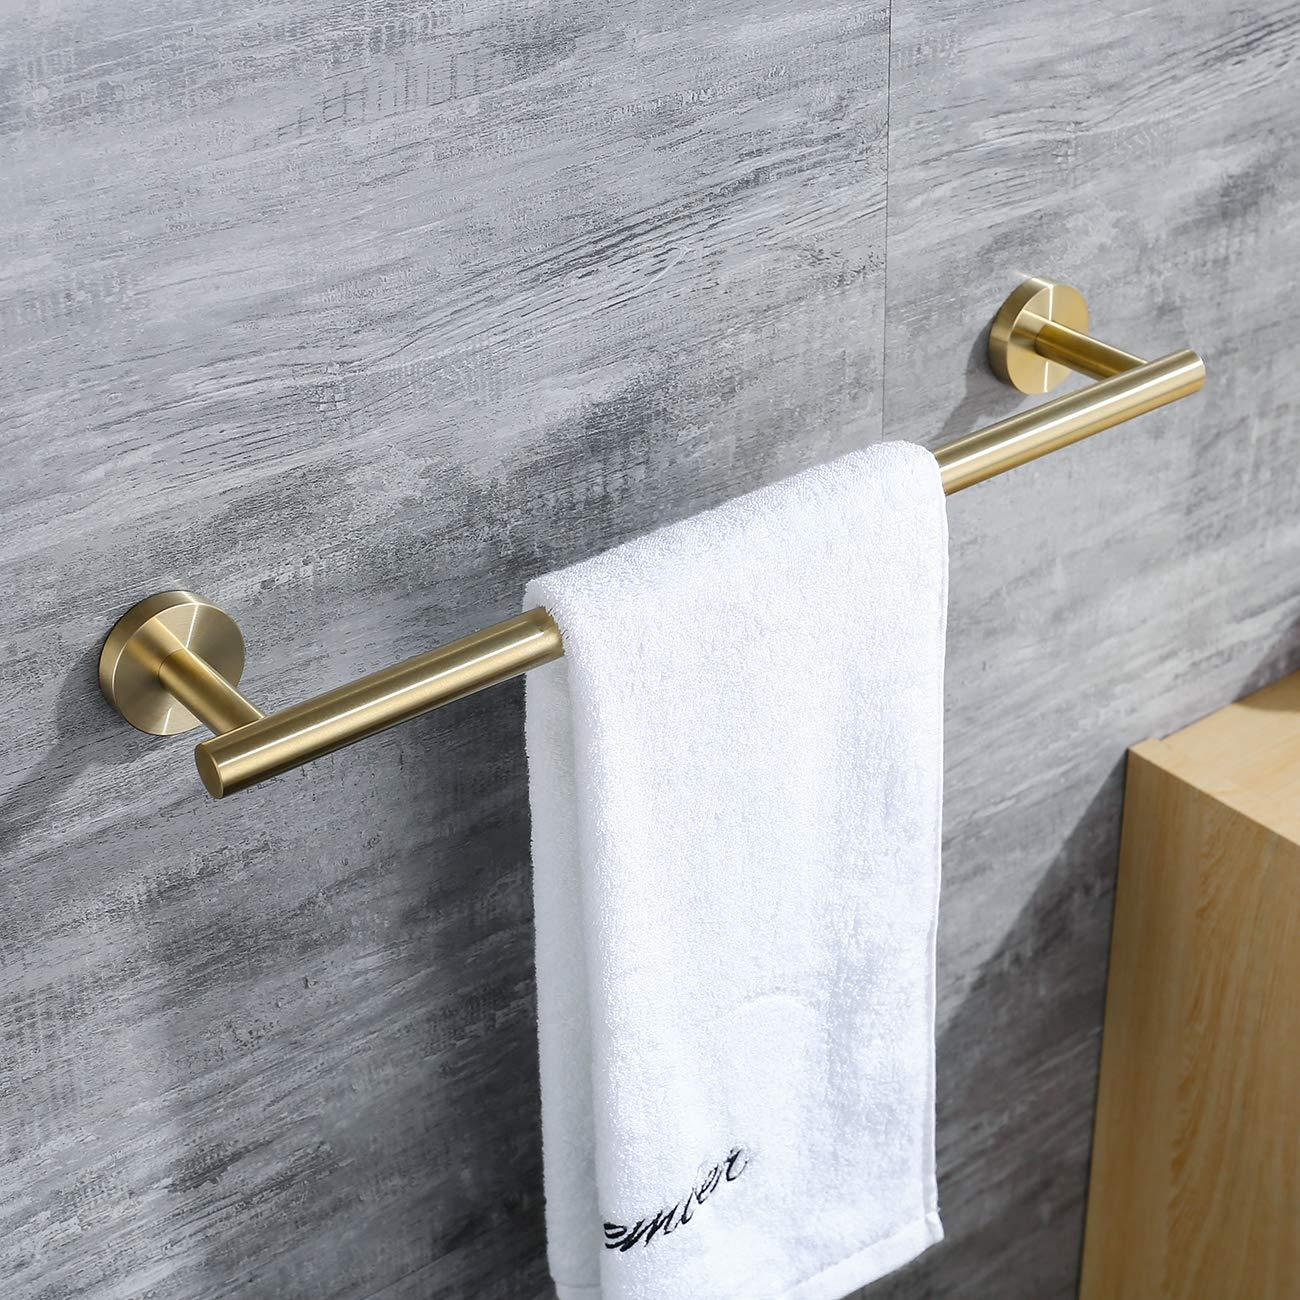 Hoooh Bath Towel Bar 18-Inch Stainless Steel Towel Rack Bathroom Towel Hanger Wall Mount Brushed Gold, A100L45-BG